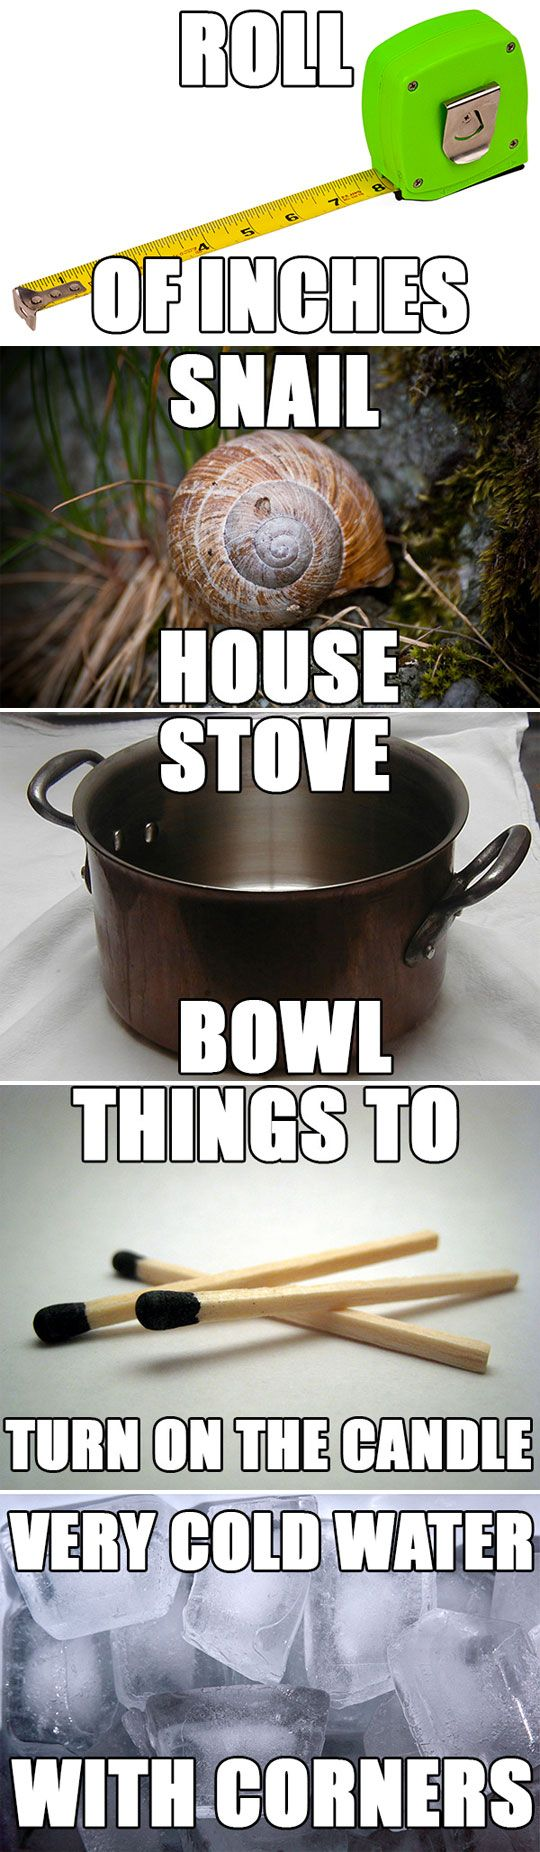 Name a random object, please?